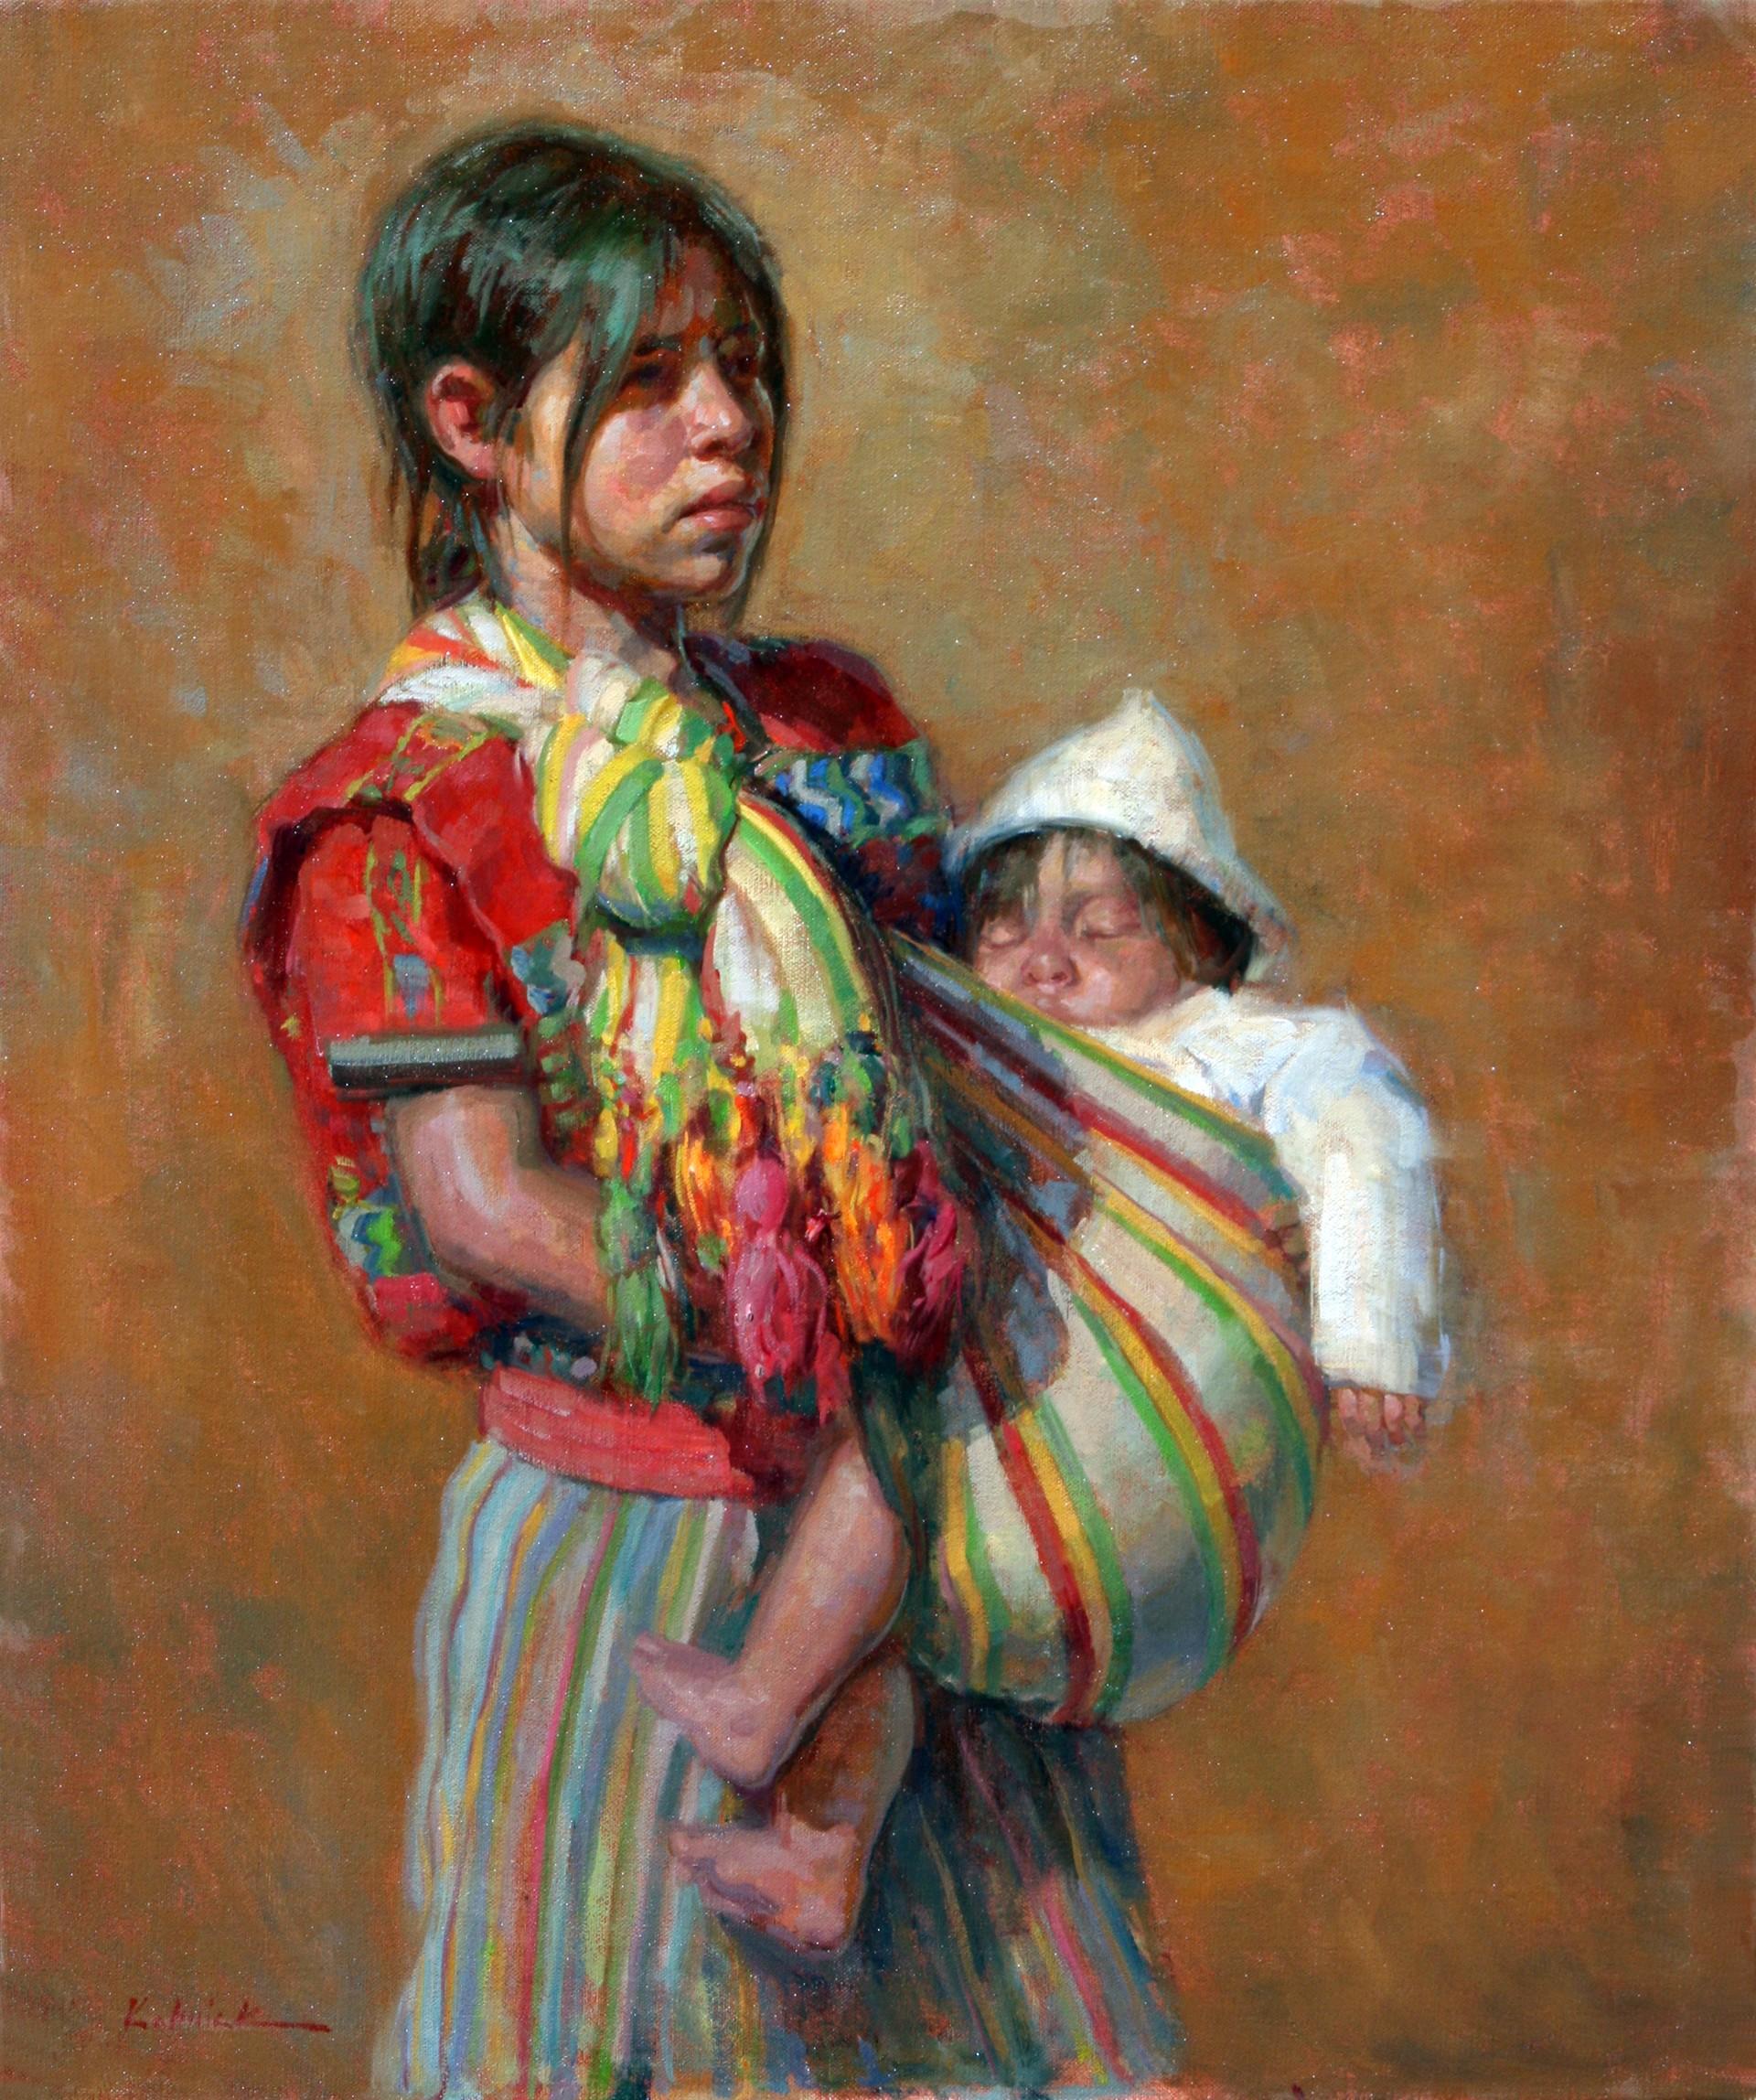 Mother's Helper by William J. Kalwick Jr.